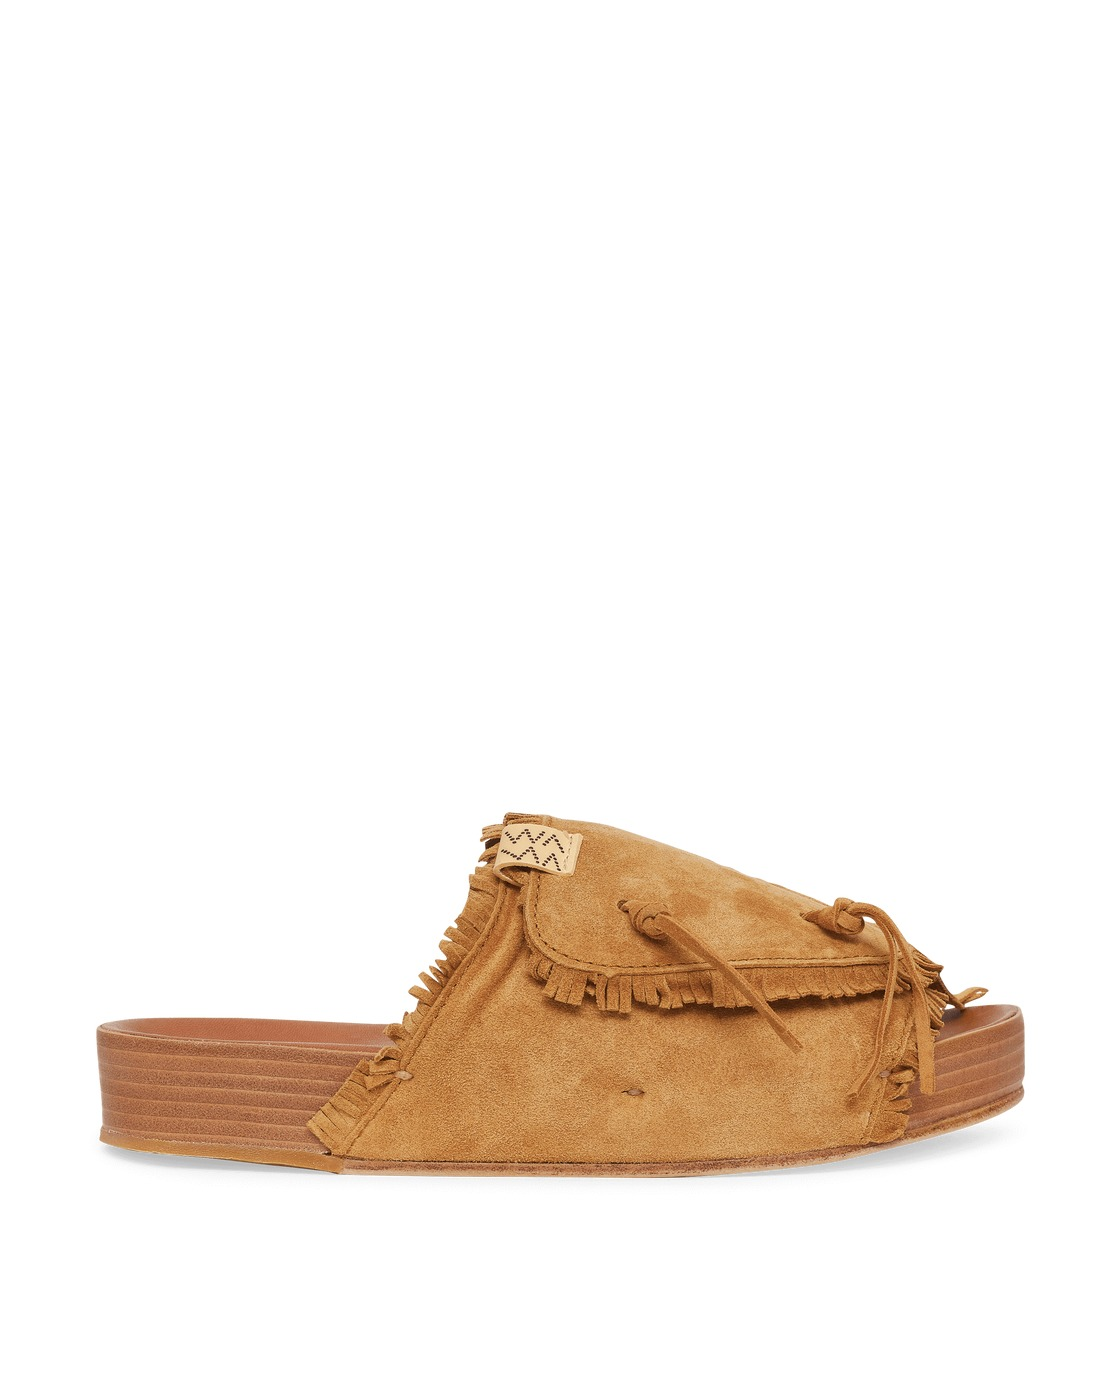 Photo: Visvim Christo Shaman Folk Sandals Light Brown